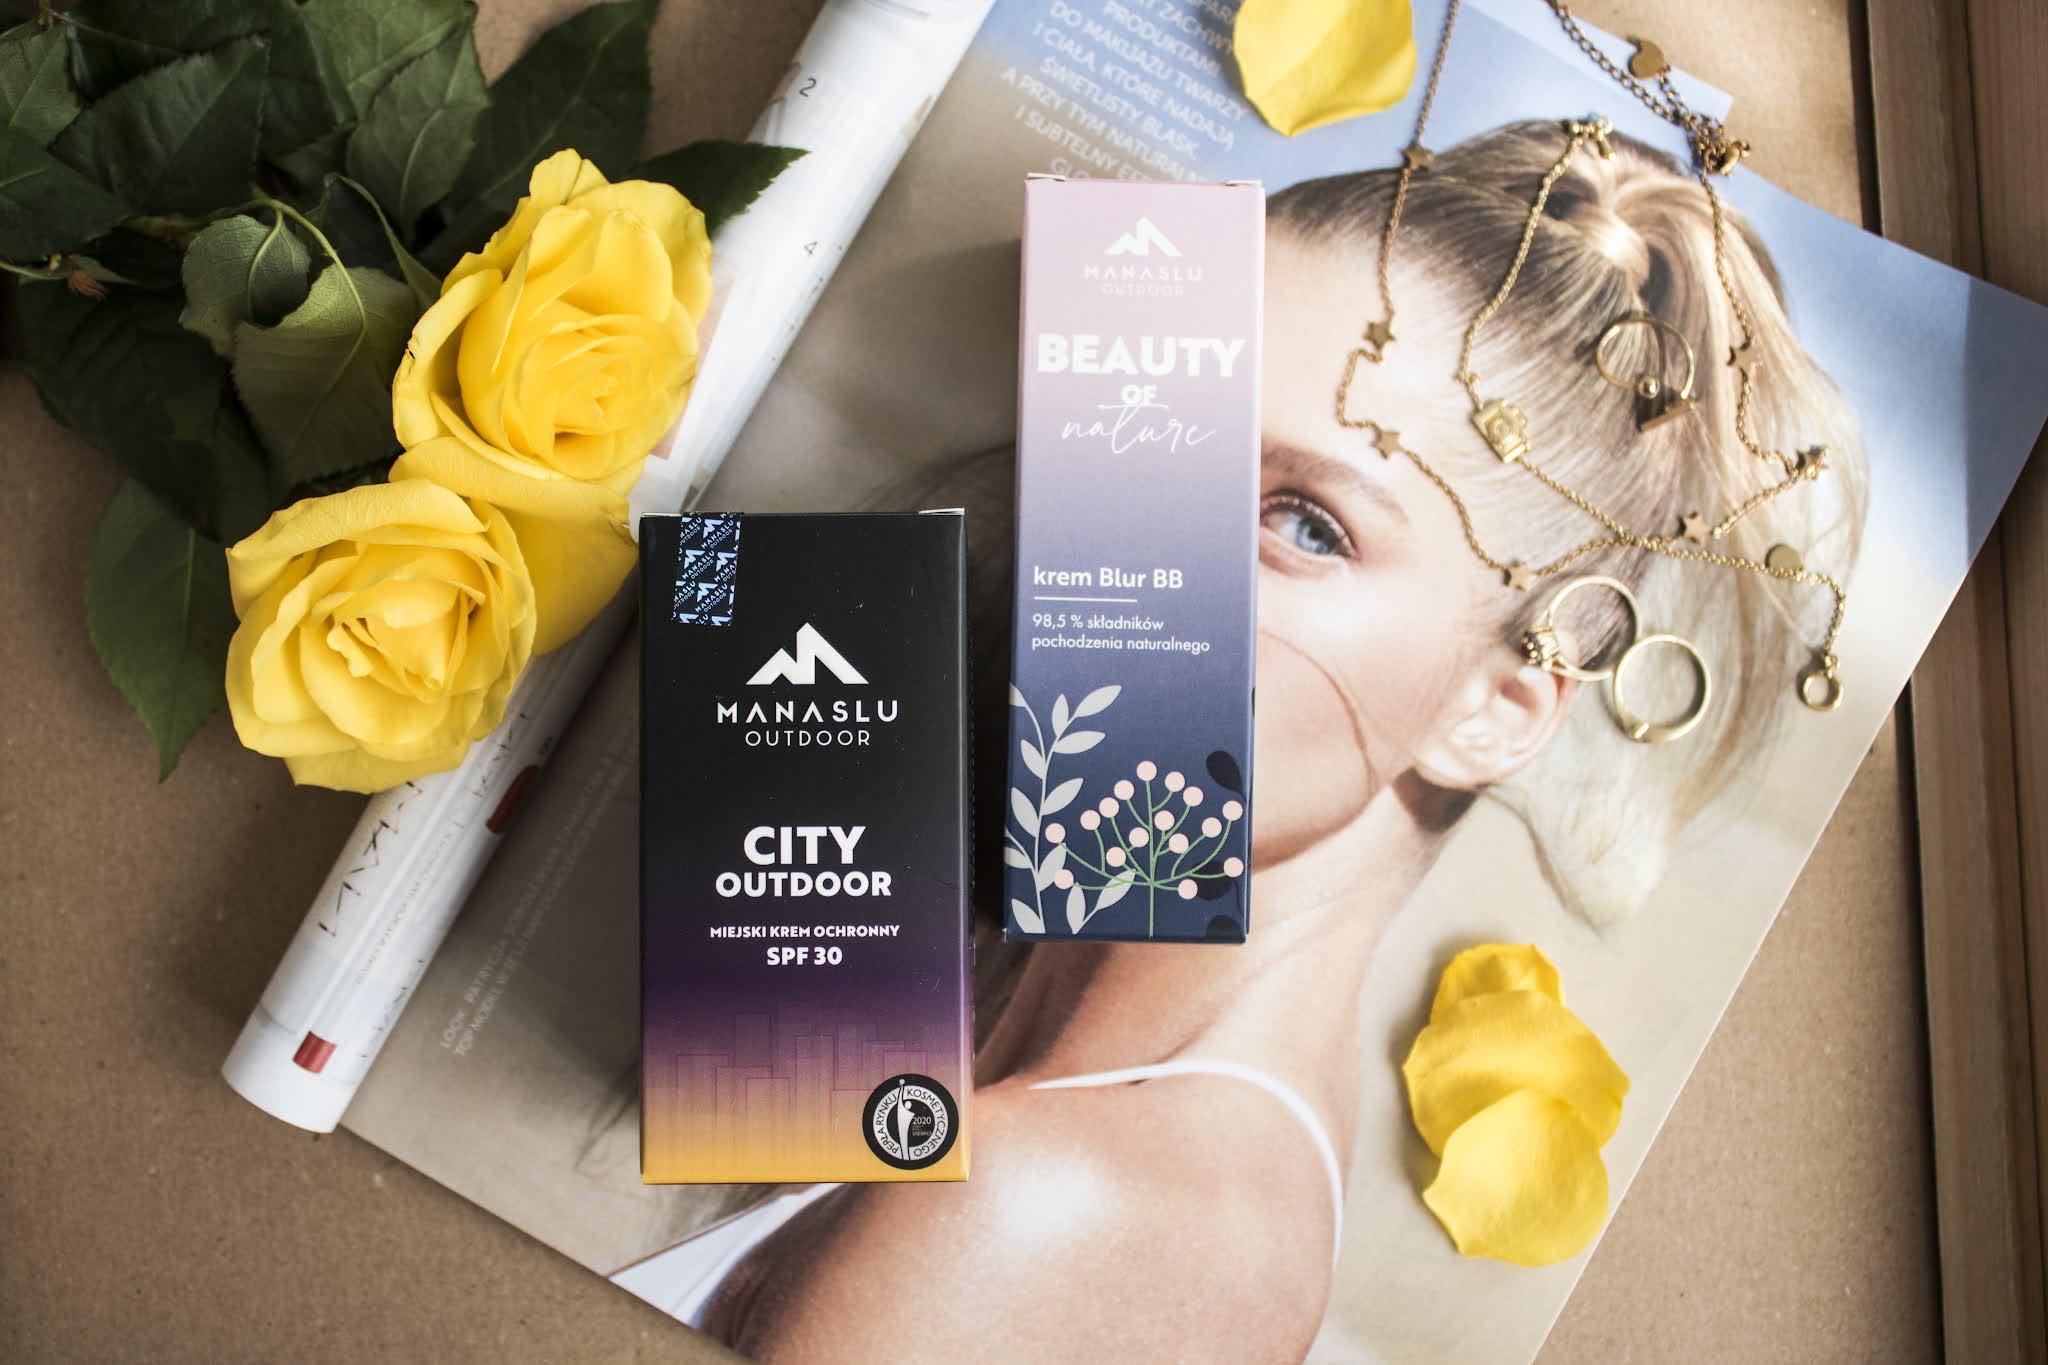 Manaslu outdoor - naturalne kosmetyki z filtrem SPF